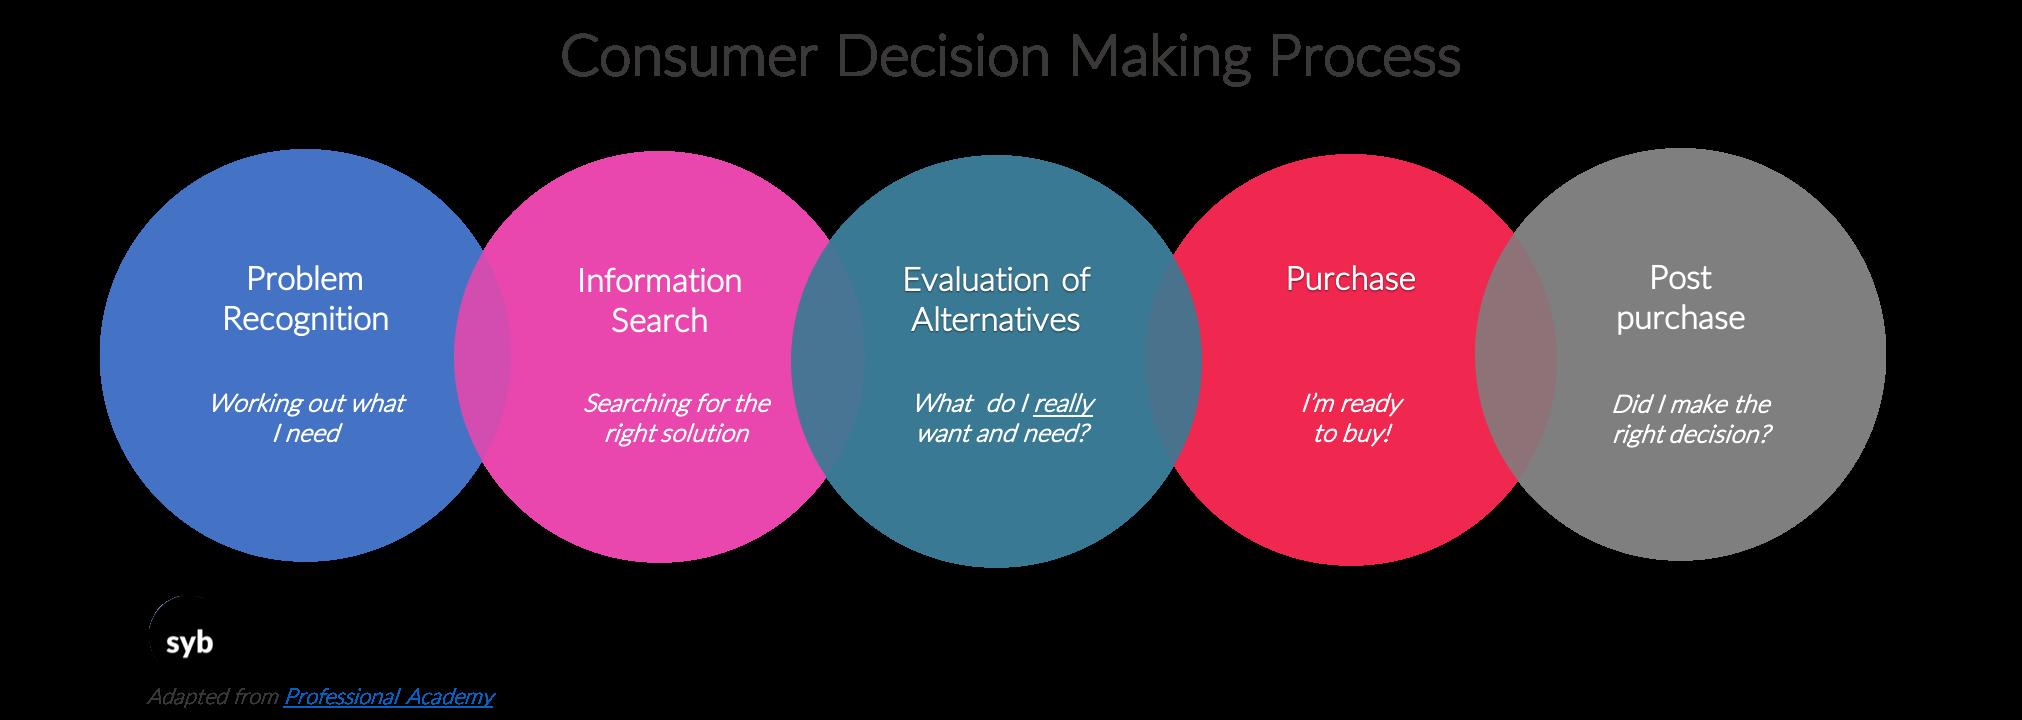 consumerdecisionmakingprocess.png